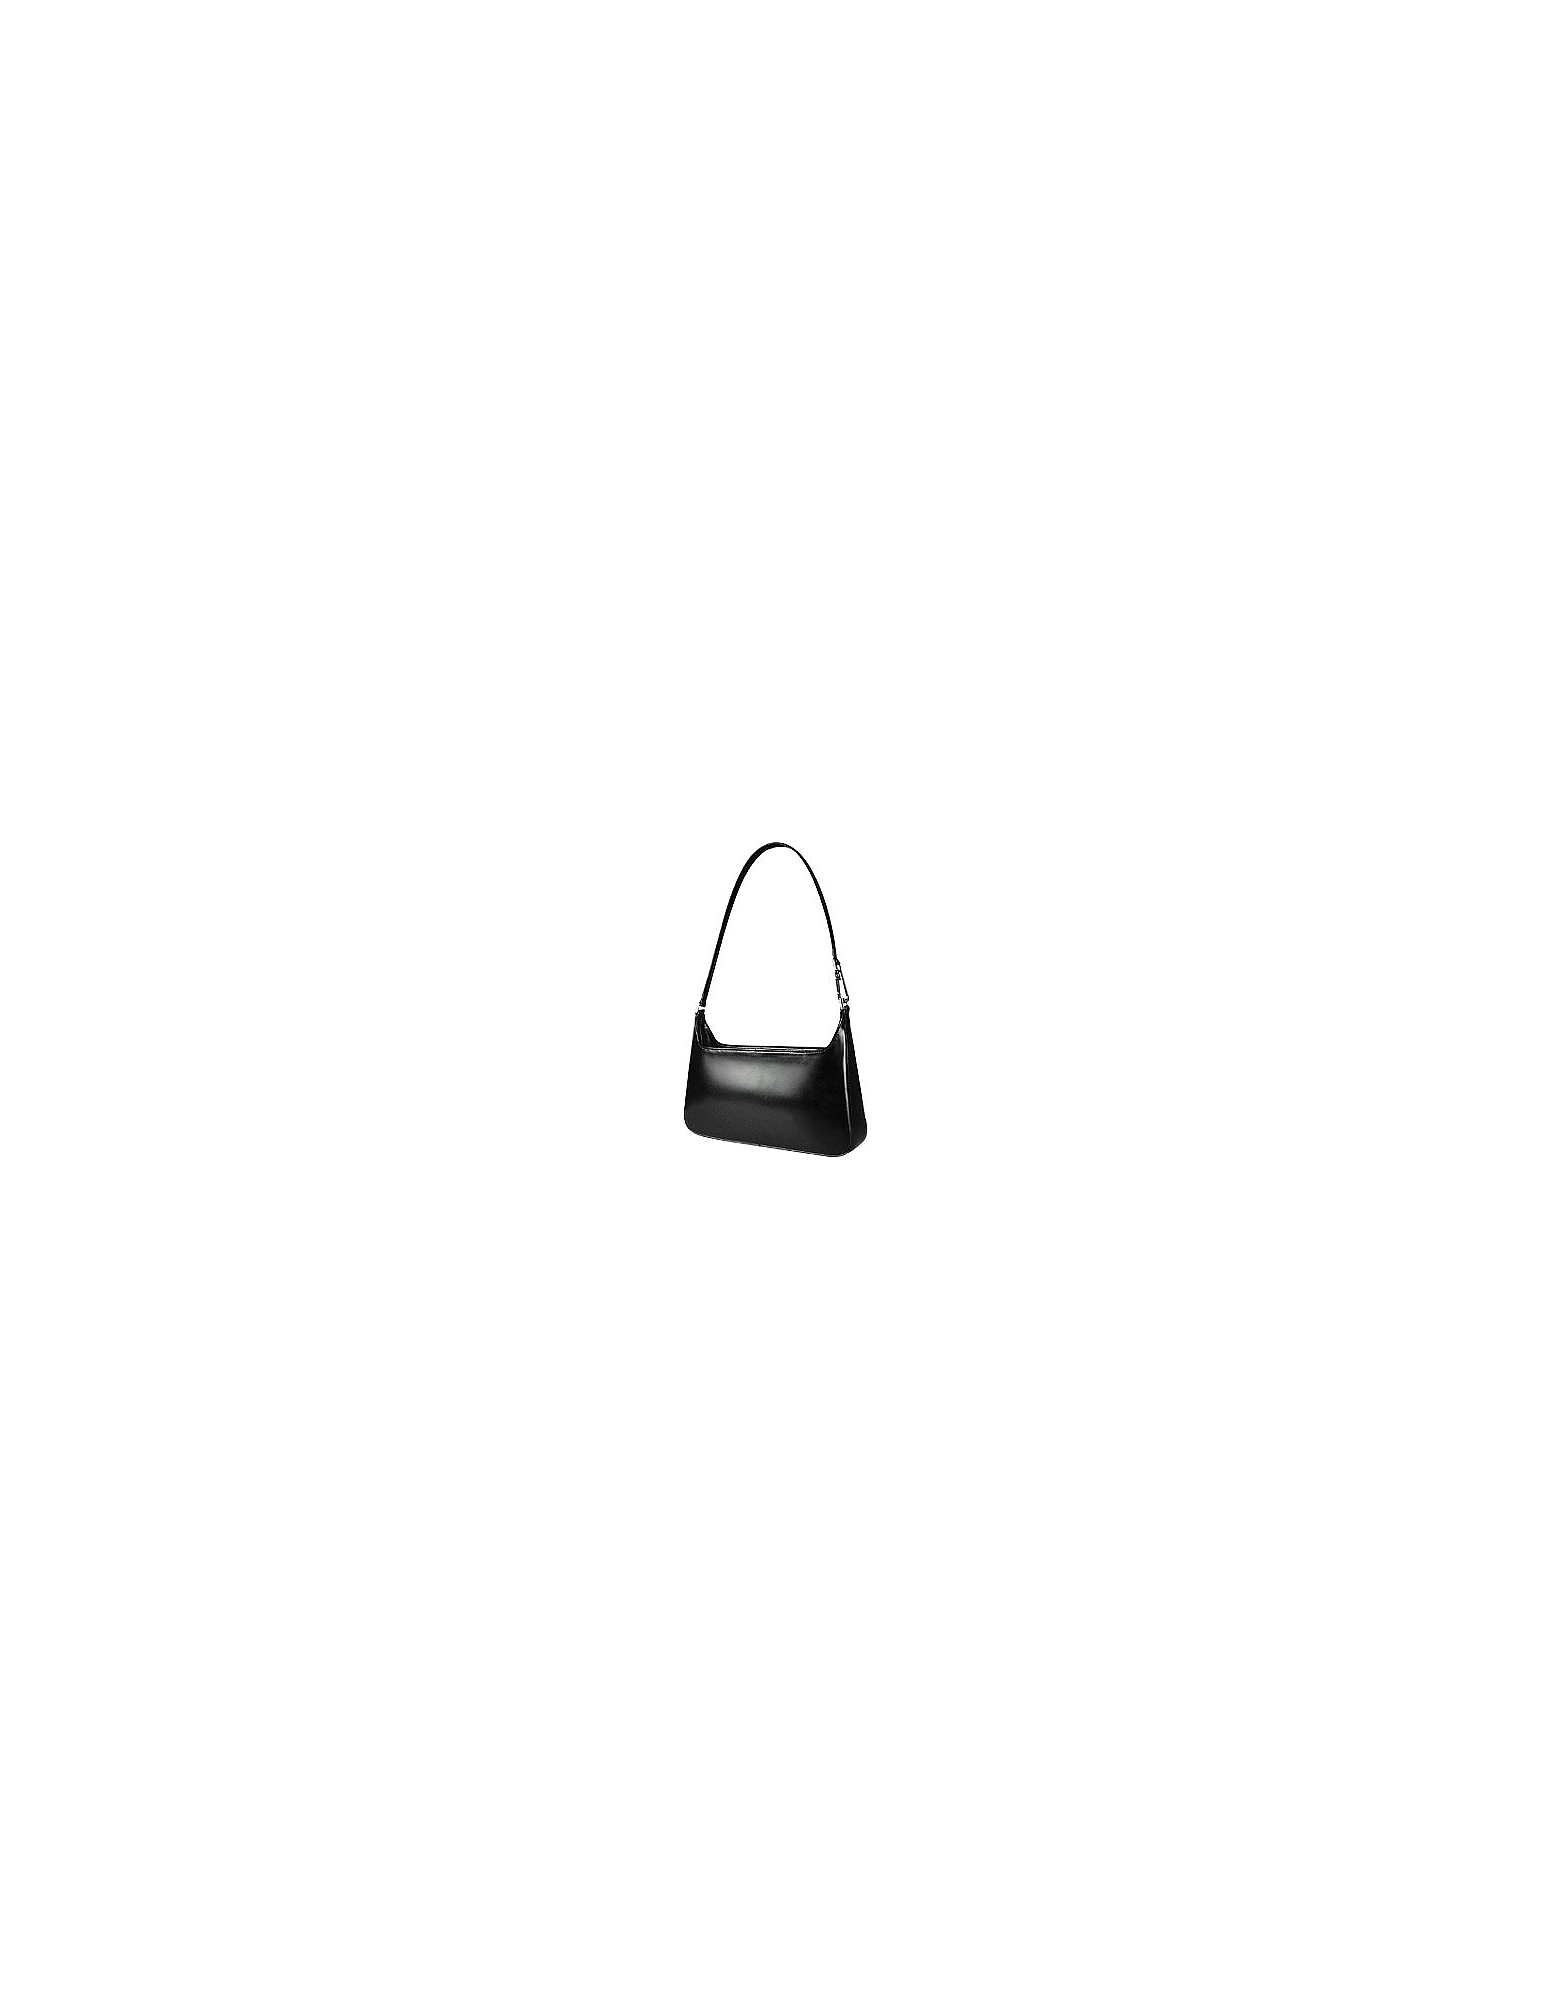 Fontanelli Designer Handbags, Classic Black Leather Handbag